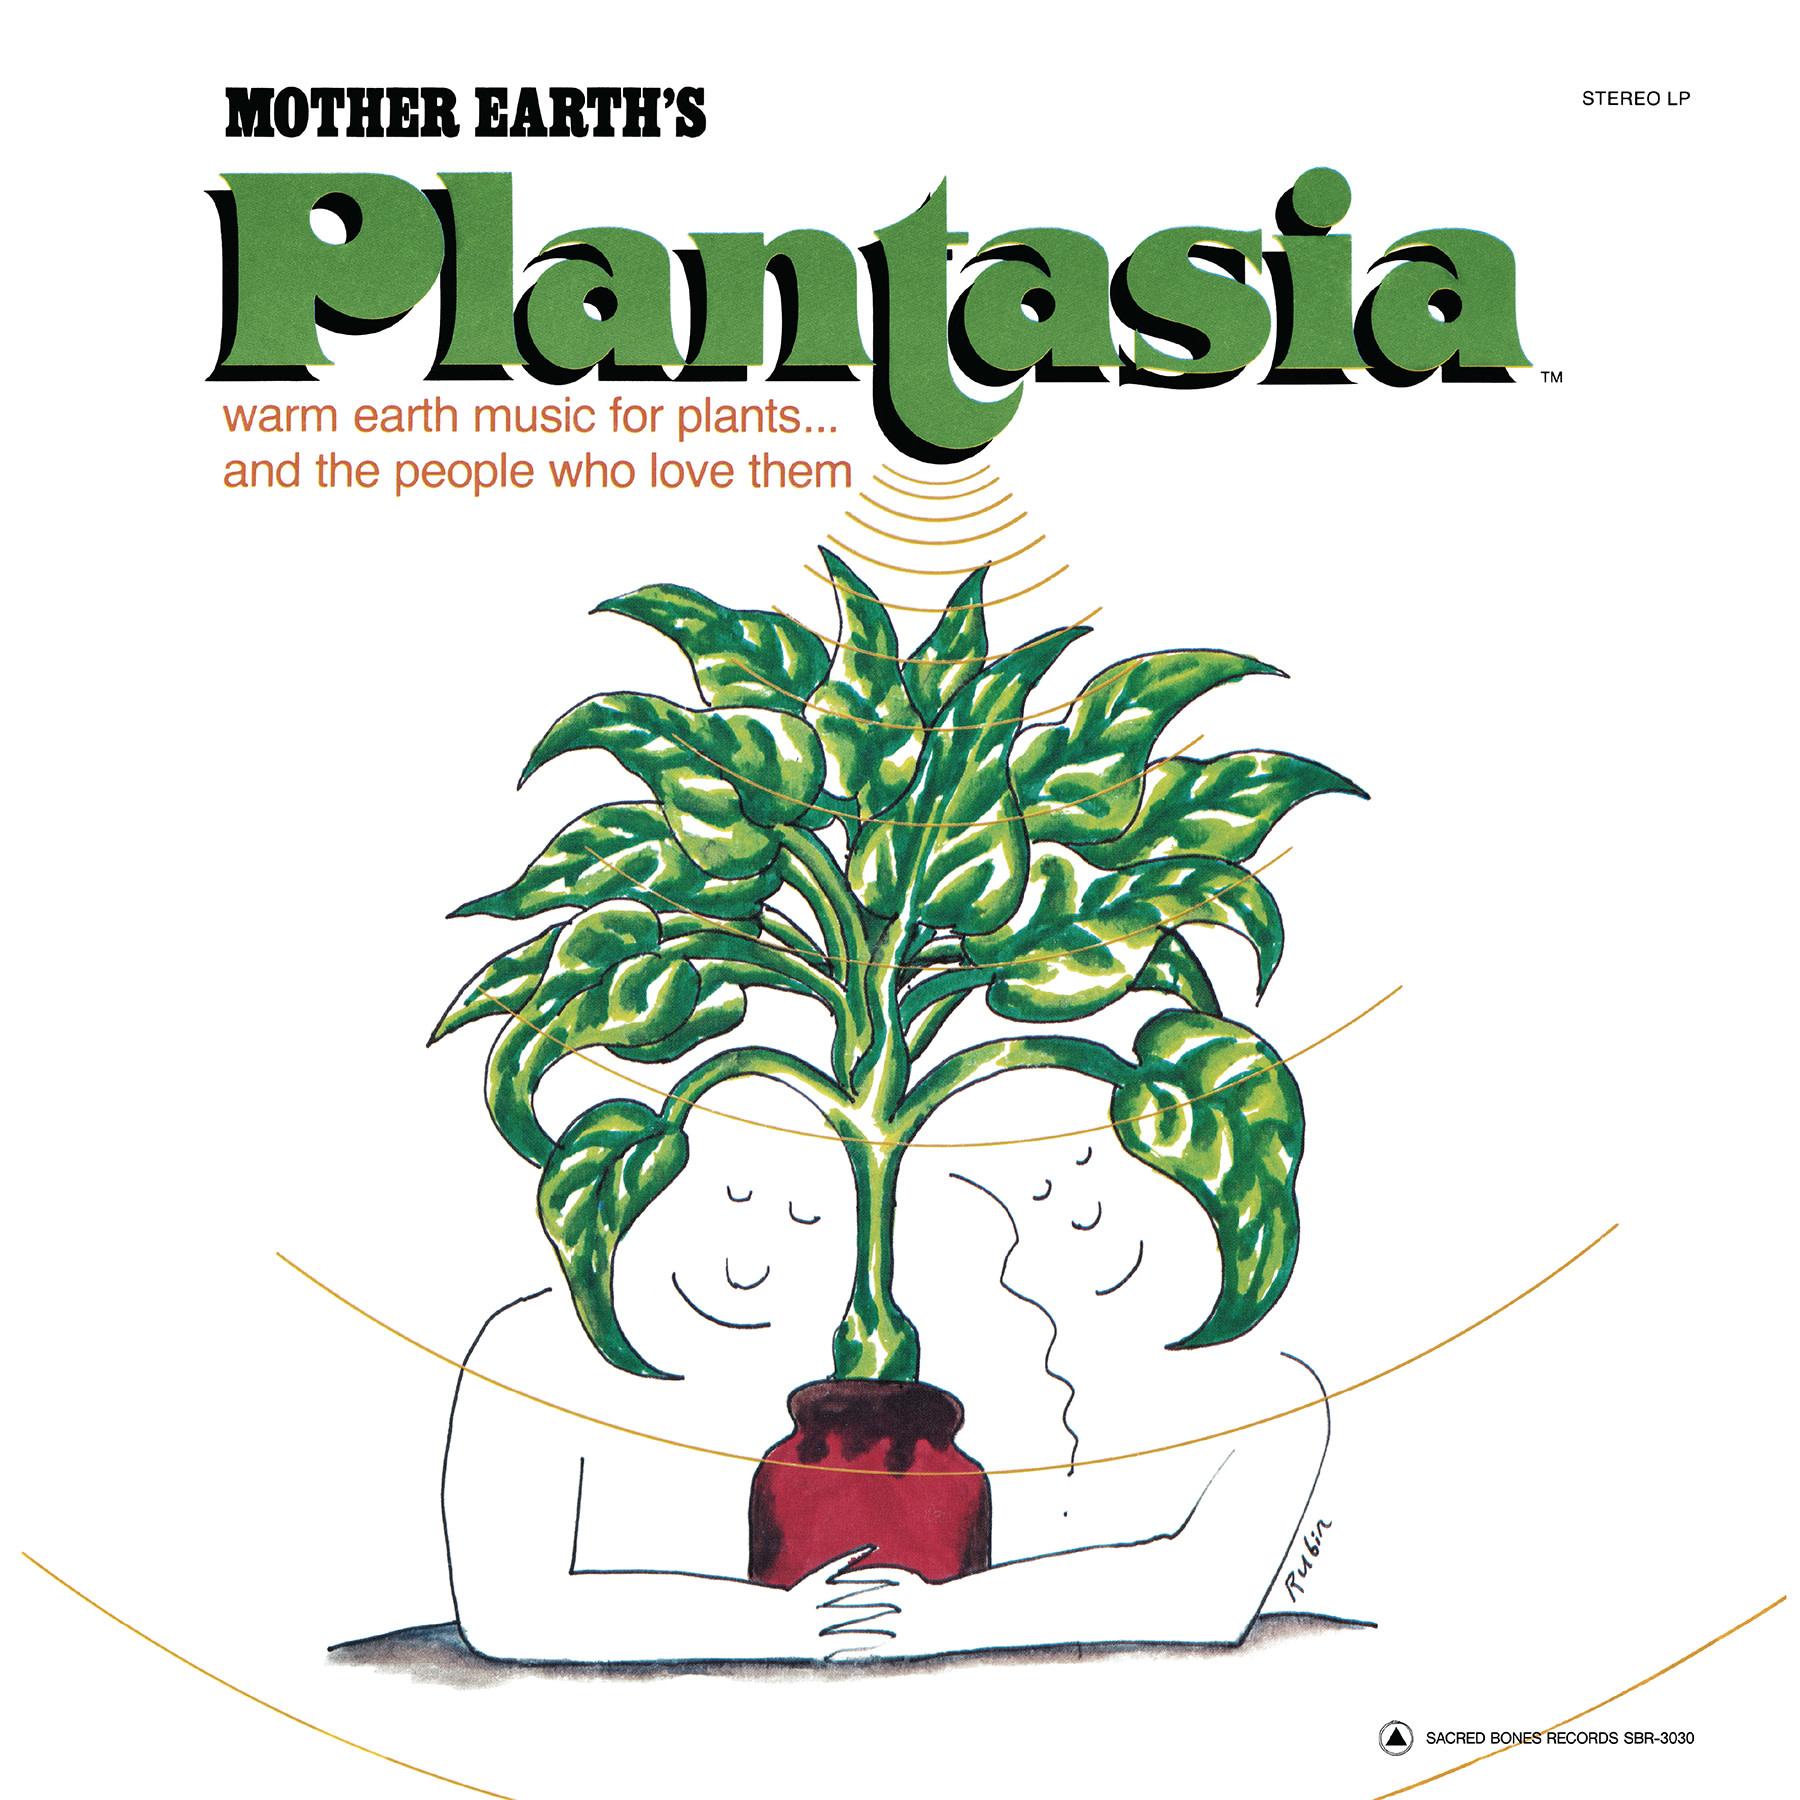 Mort Garson • Mother Earth's Plantasia (Version audiophile 180g, 2xLP, 45rpm)-1